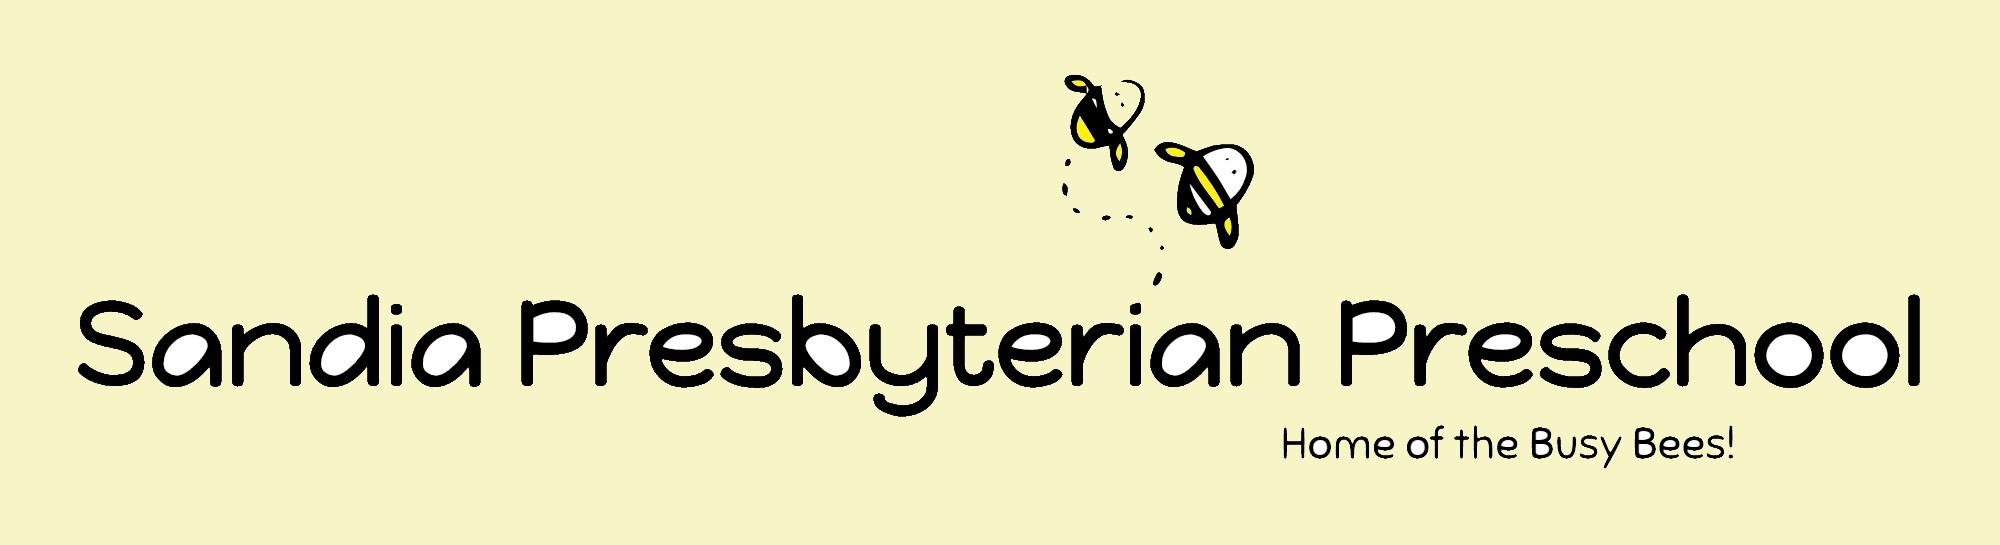 Sandia Presbyterian Preschool-logo-COLOR.jpg